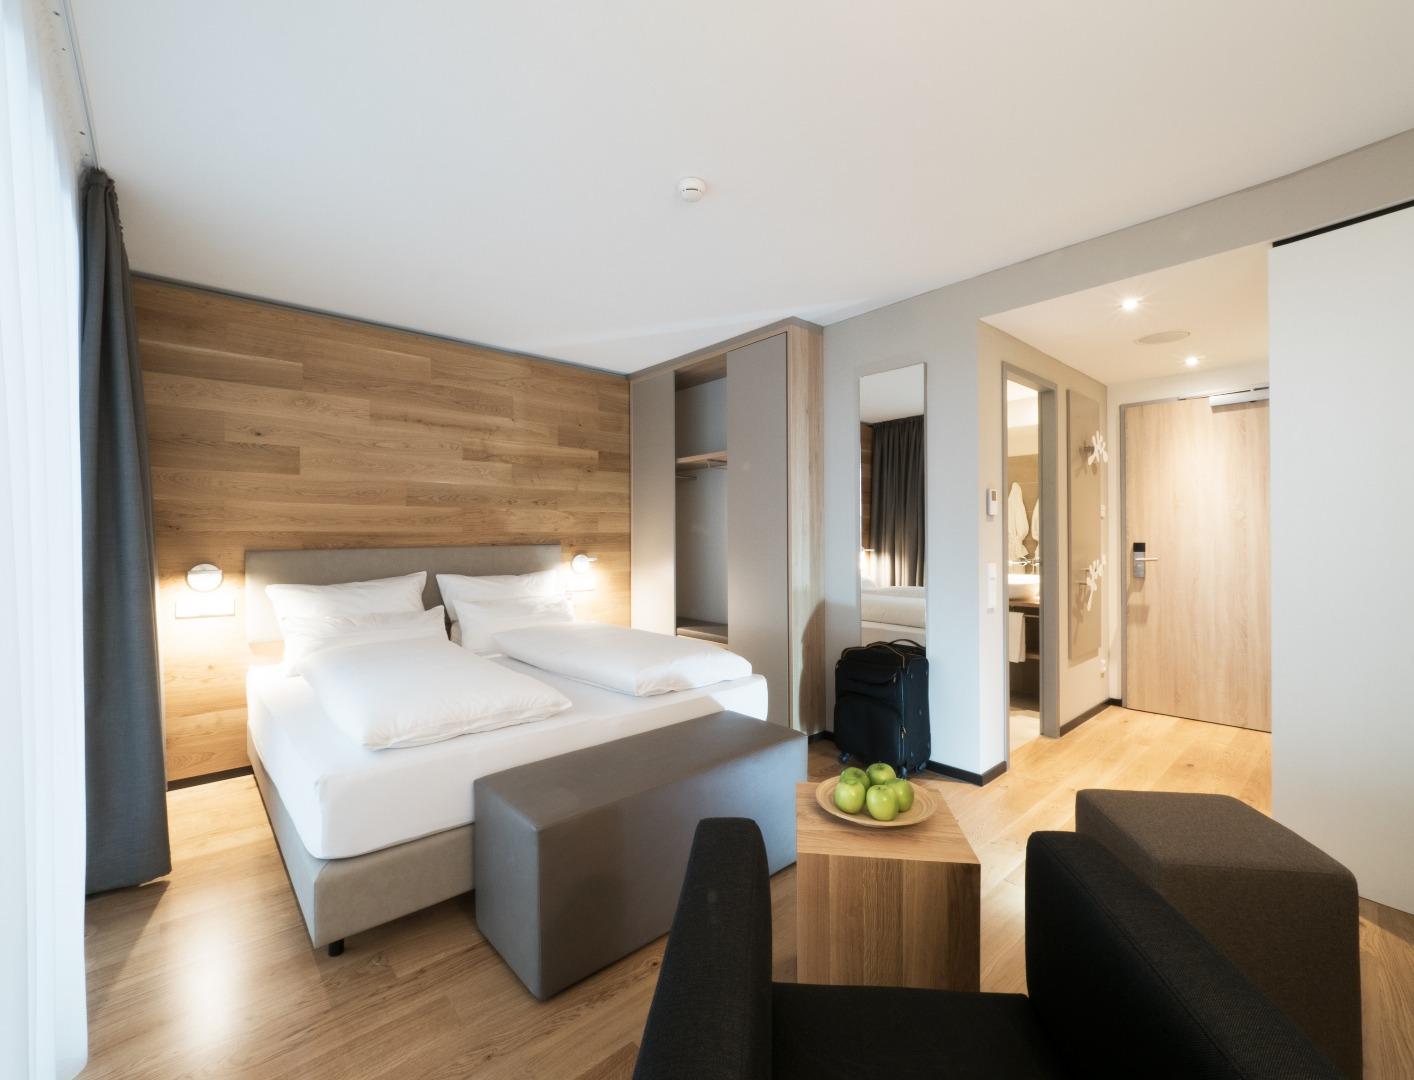 wonnemar resort hotel wismar hotelbewertung. Black Bedroom Furniture Sets. Home Design Ideas